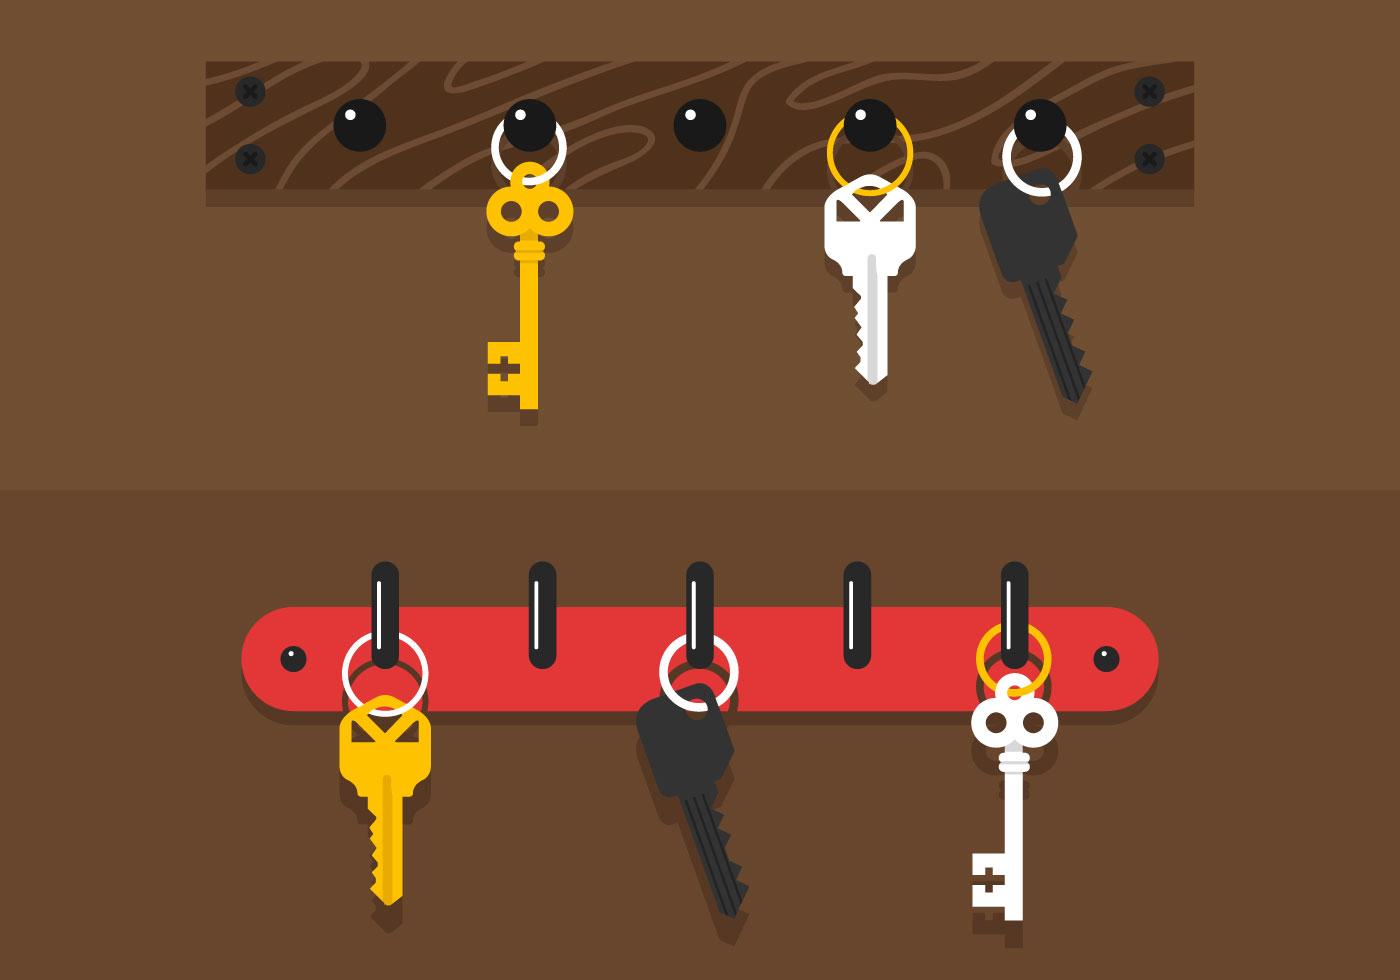 Cute Lock And Key Wallpaper Key Holder Vector Download Free Vector Art Stock